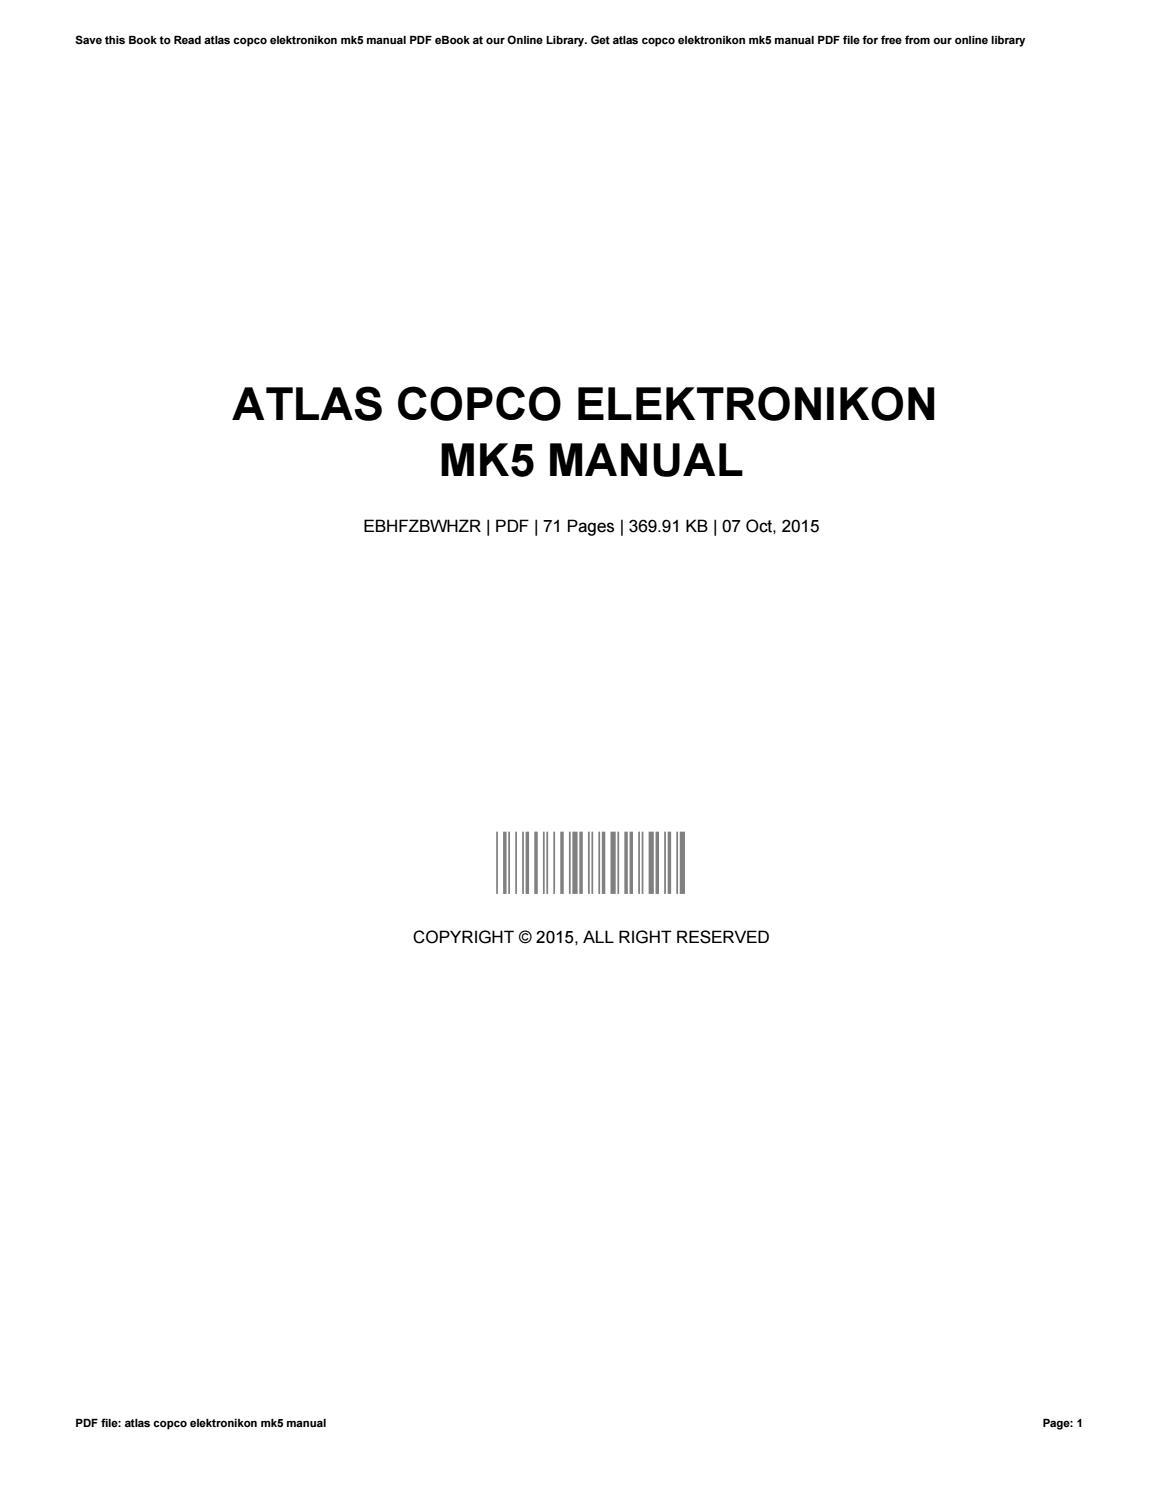 Atlas    copco    elektronikon mk5 manual by PatriciaMiller2583  Issuu